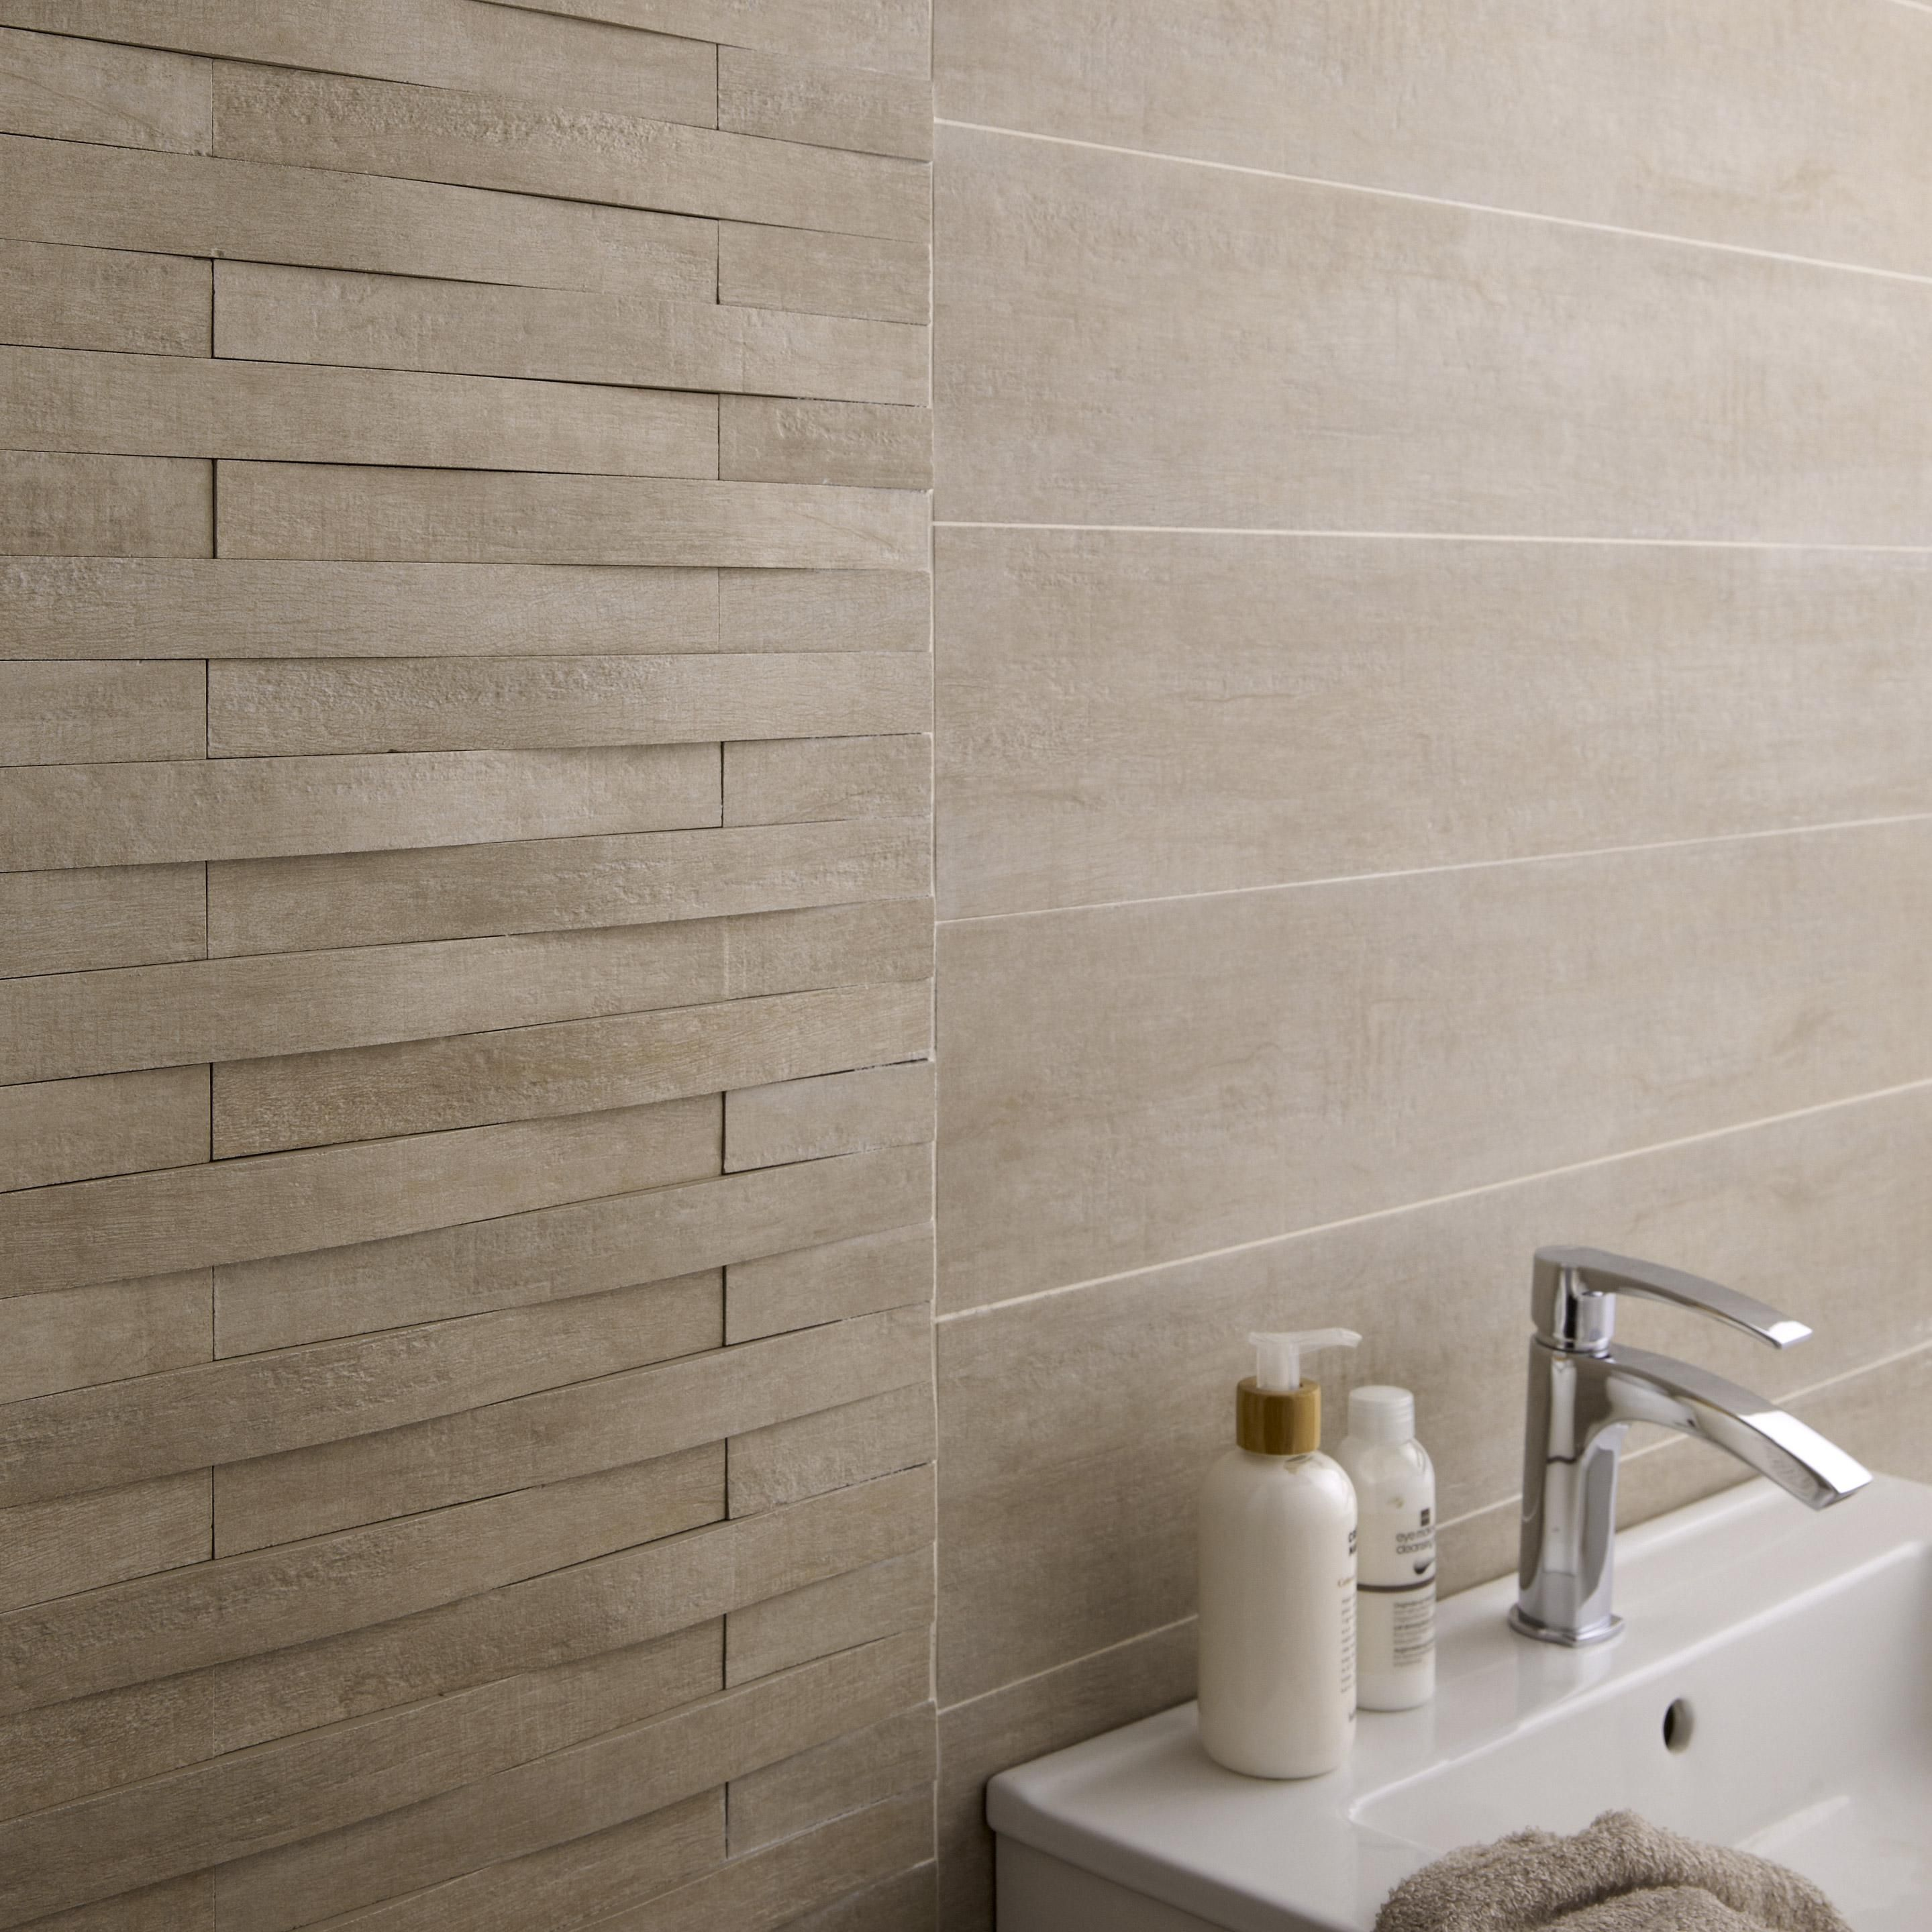 Carrelage mur et sol intenso bois beige mat l.17 x L.17 cm, Taiga